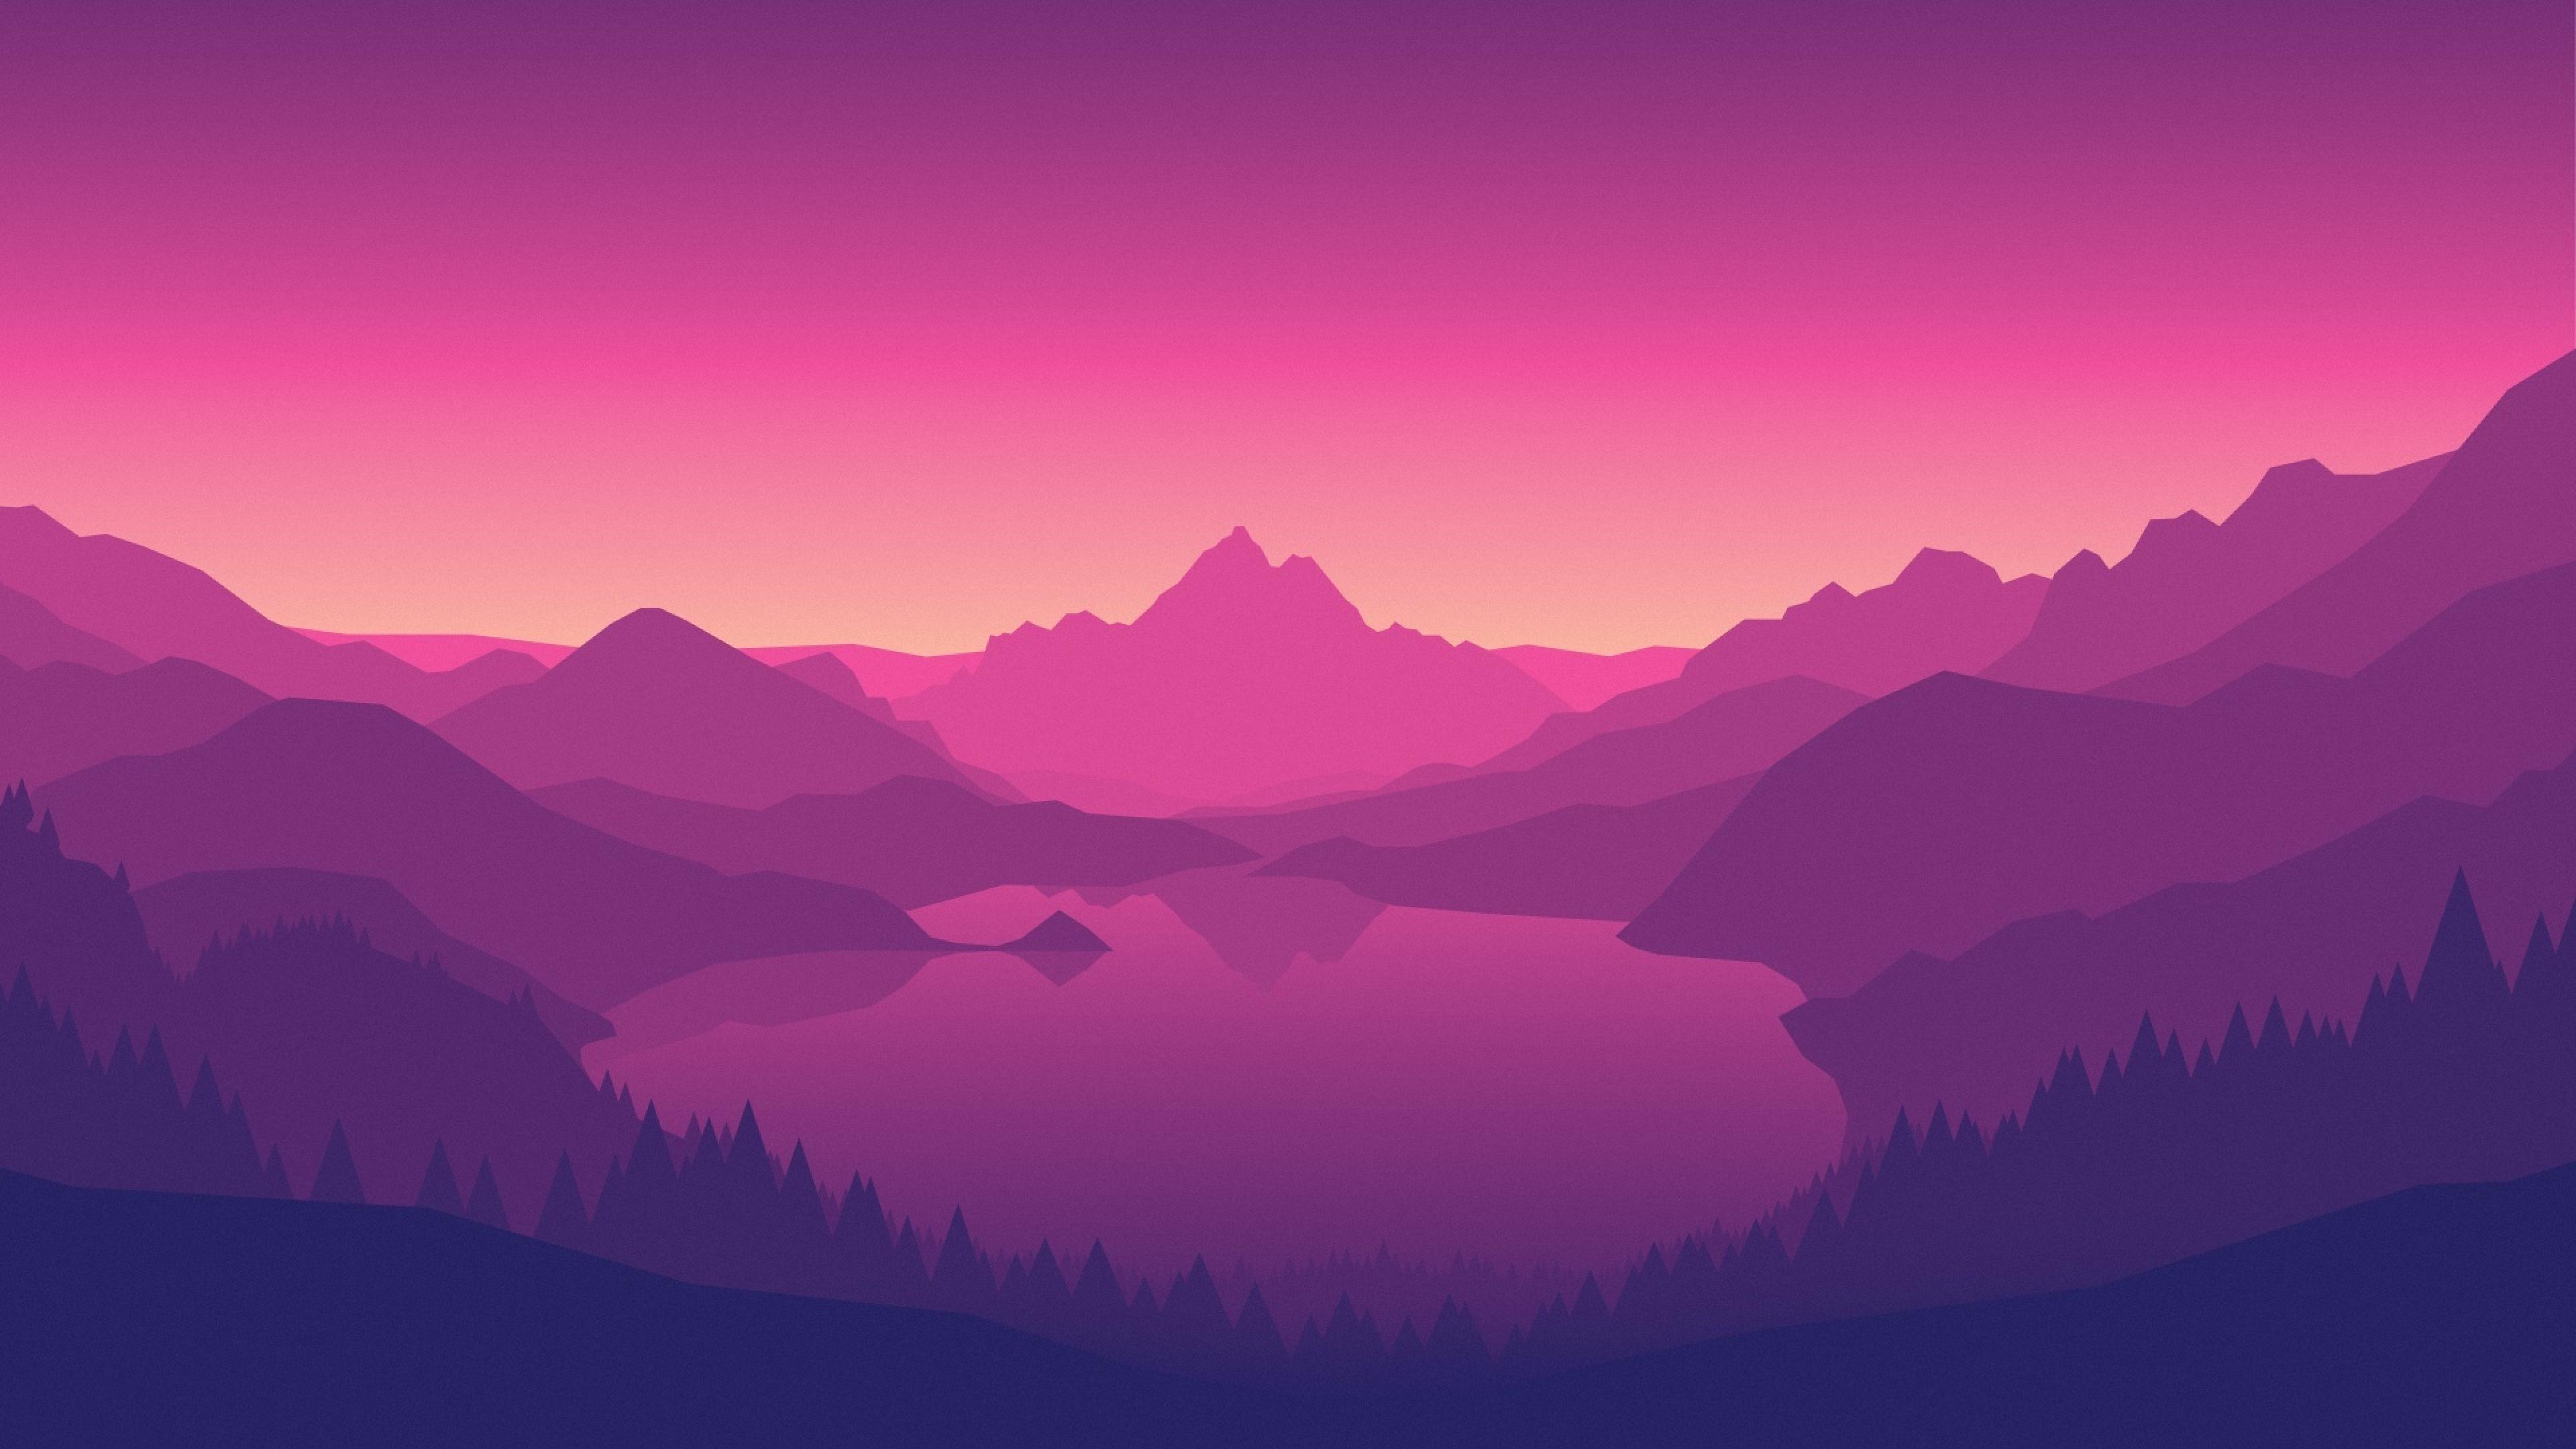 3840x2160 Firewatch Video Games Mountains 4k Wallpaper Hd